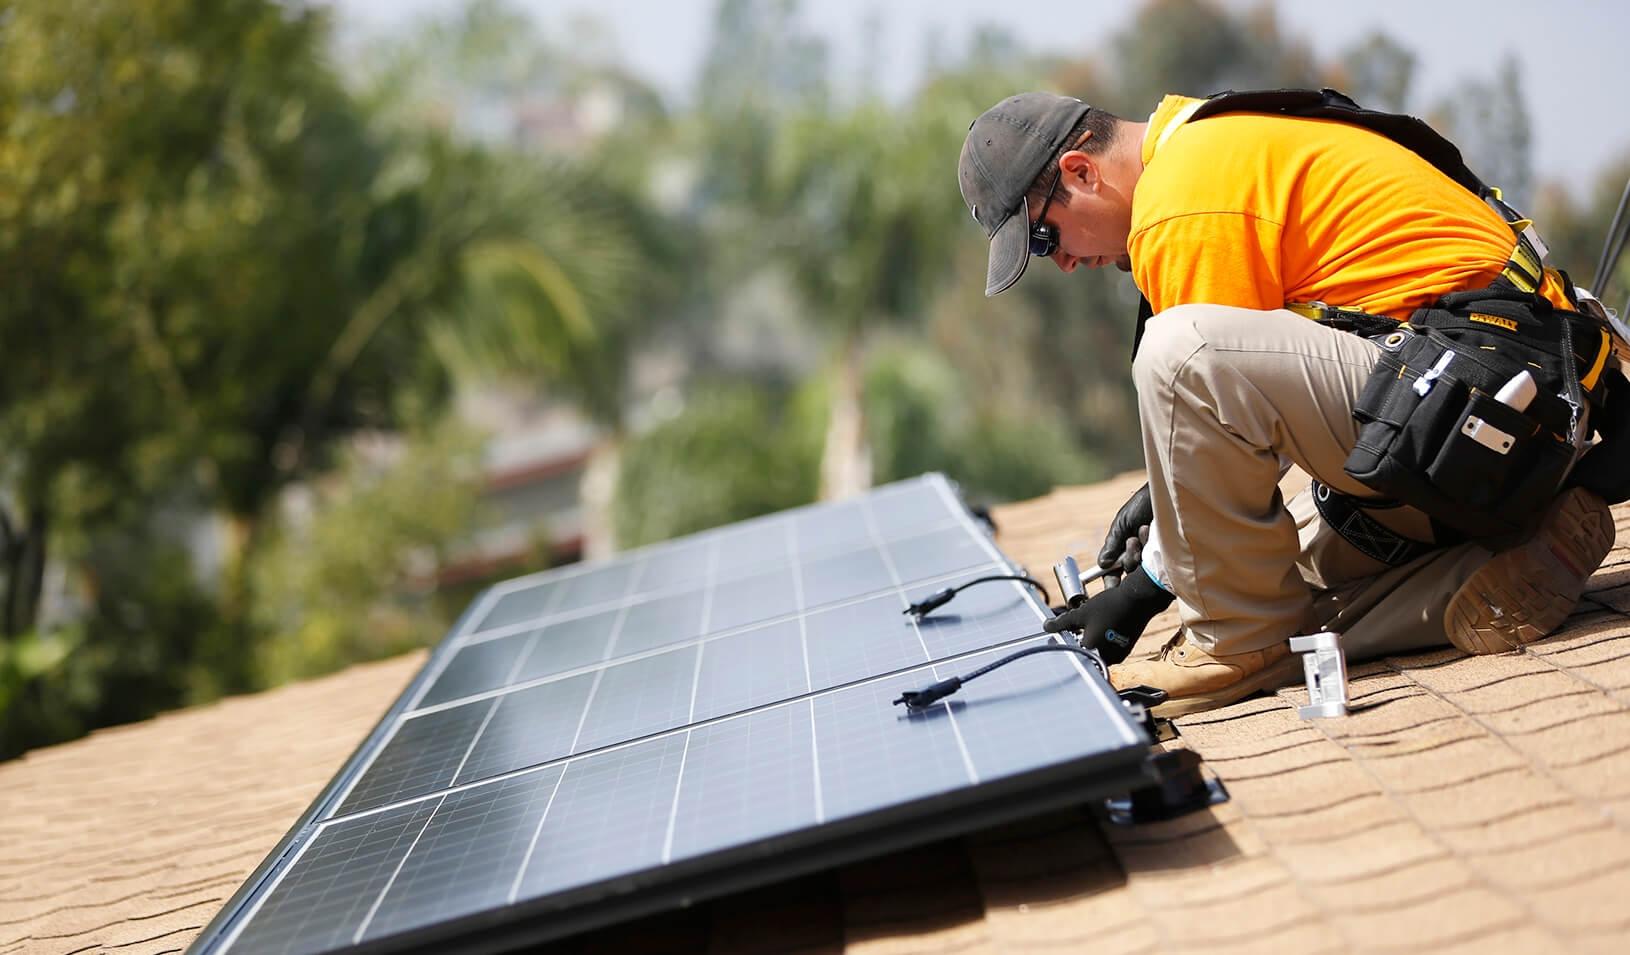 key-image-is-reichelstein-solar-install.jpg